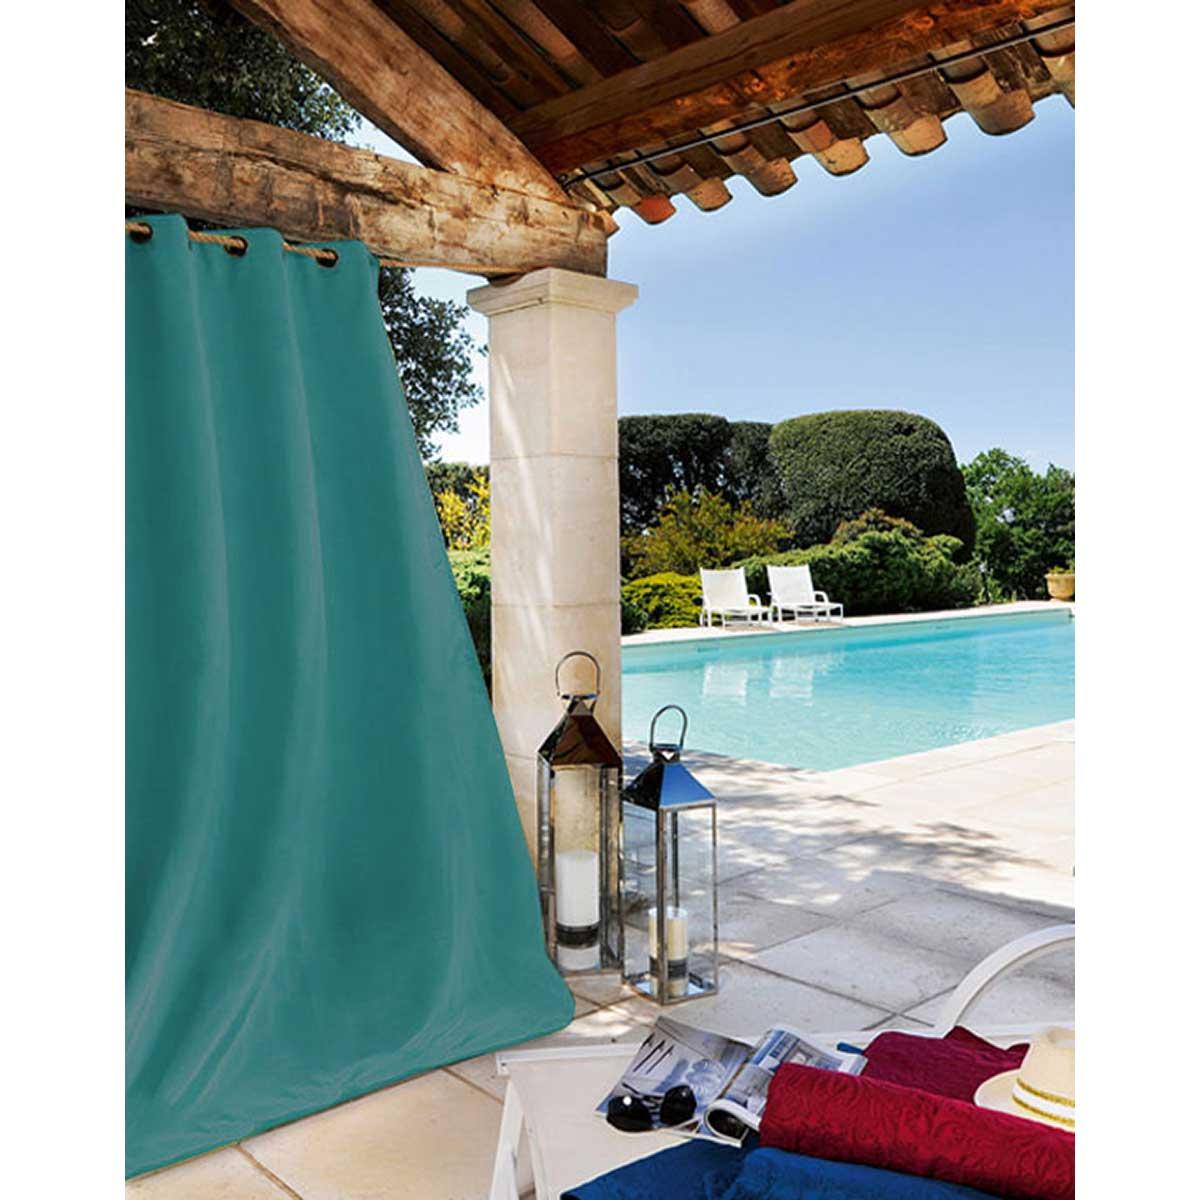 Rideau extérieur tissu outdoor toile bleu canard 240x135